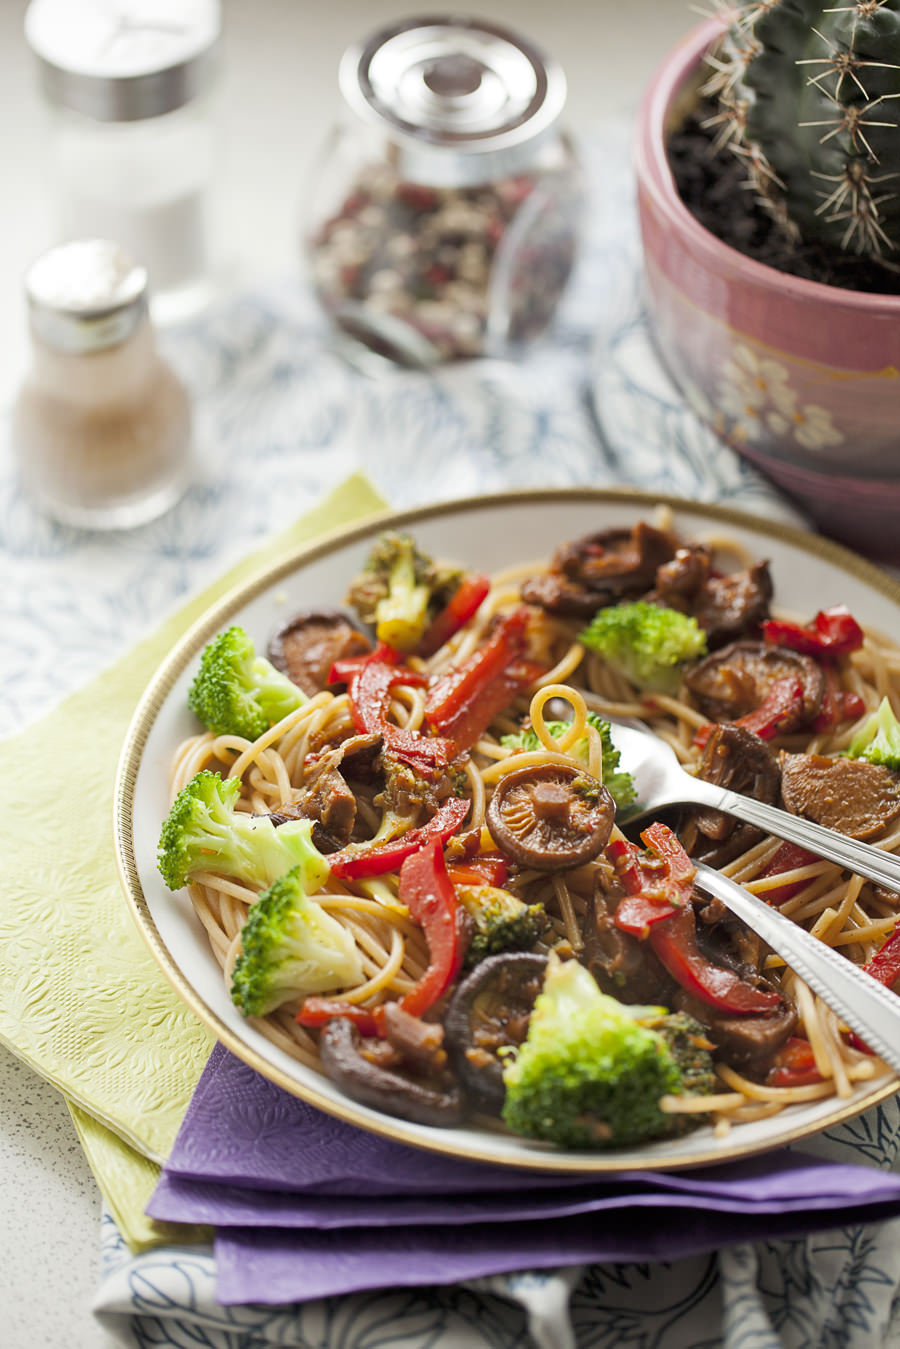 makaron z grzybami shiitake